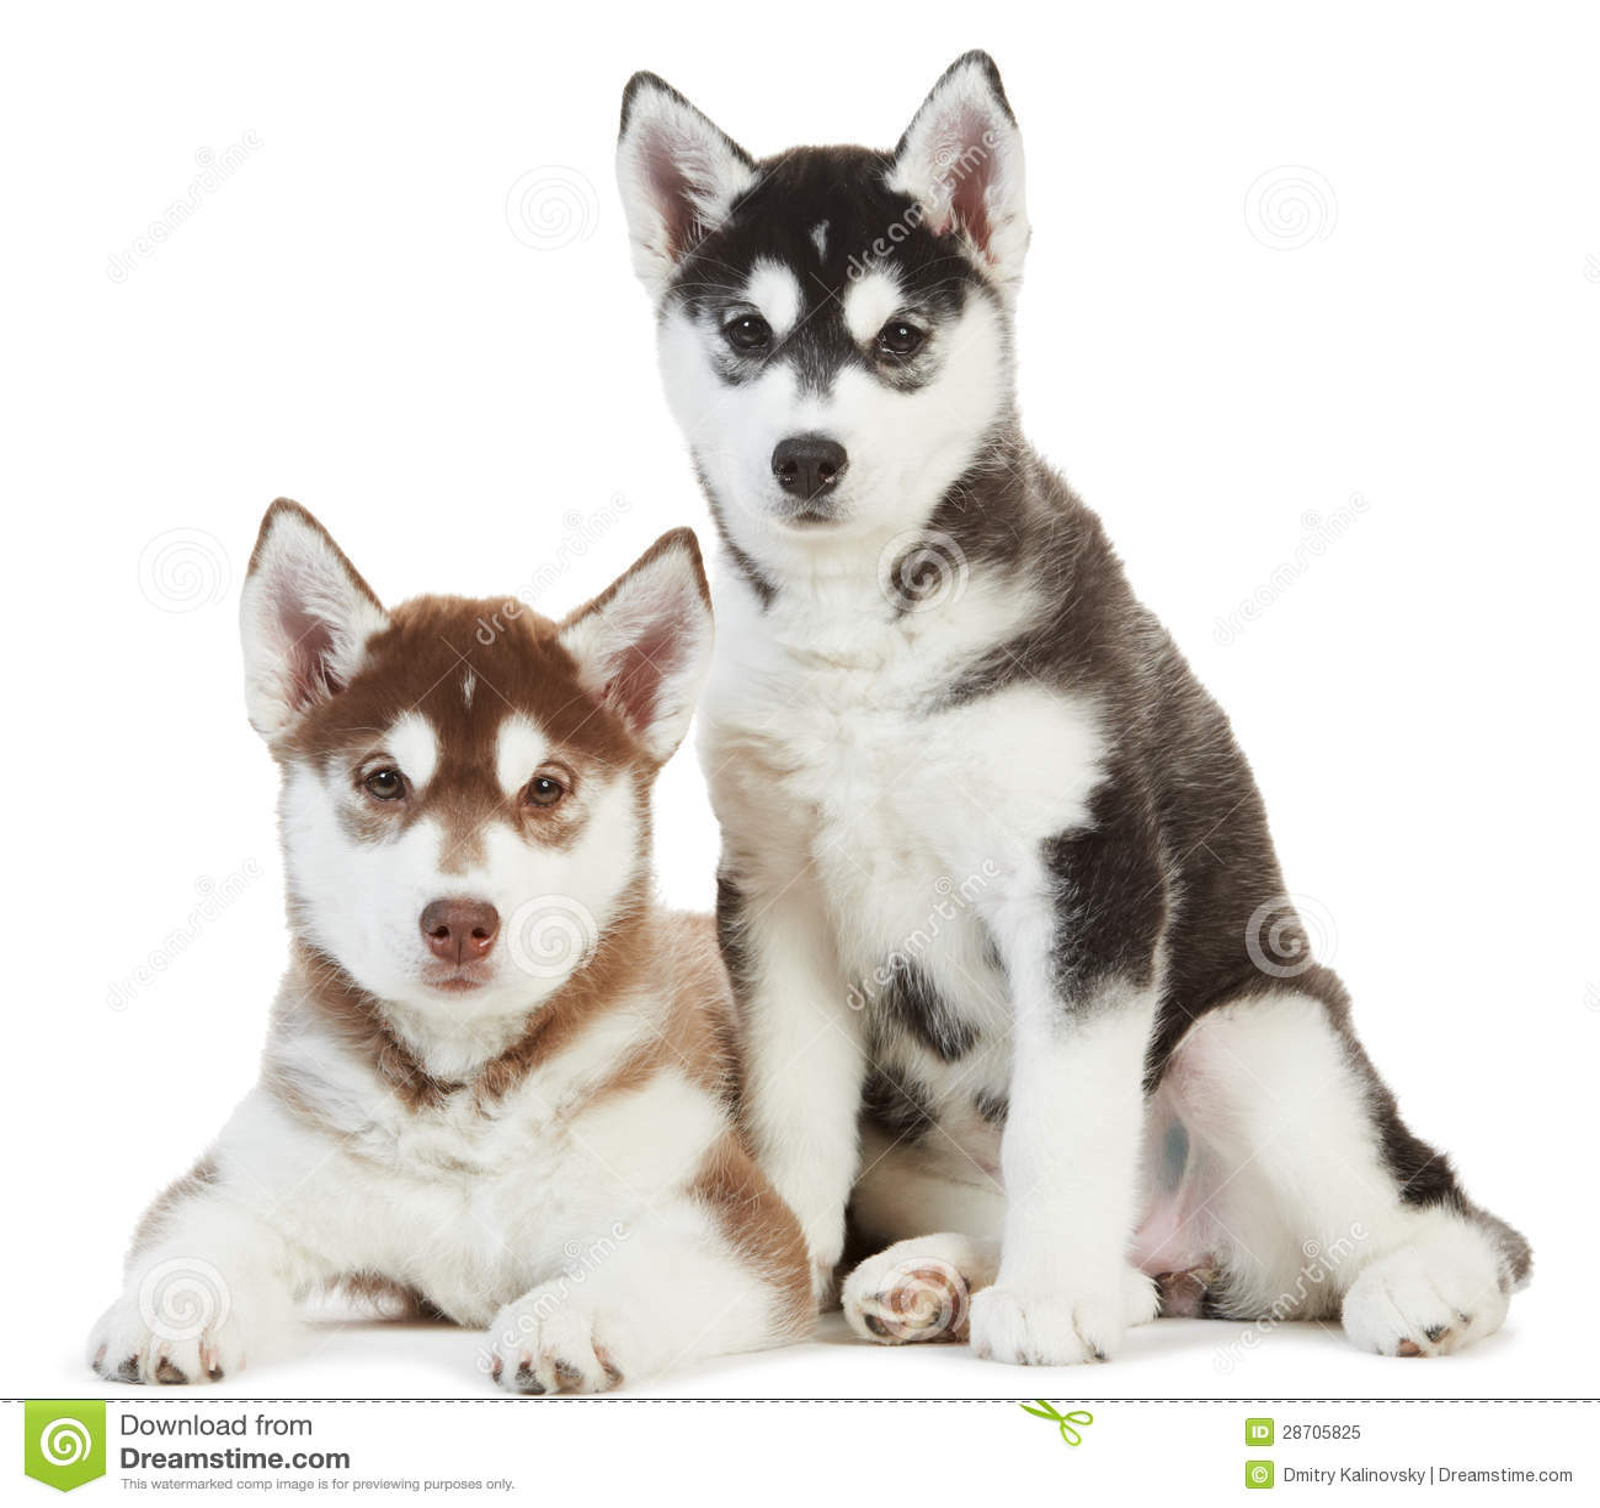 Husky Dog Names With Blue Eyes